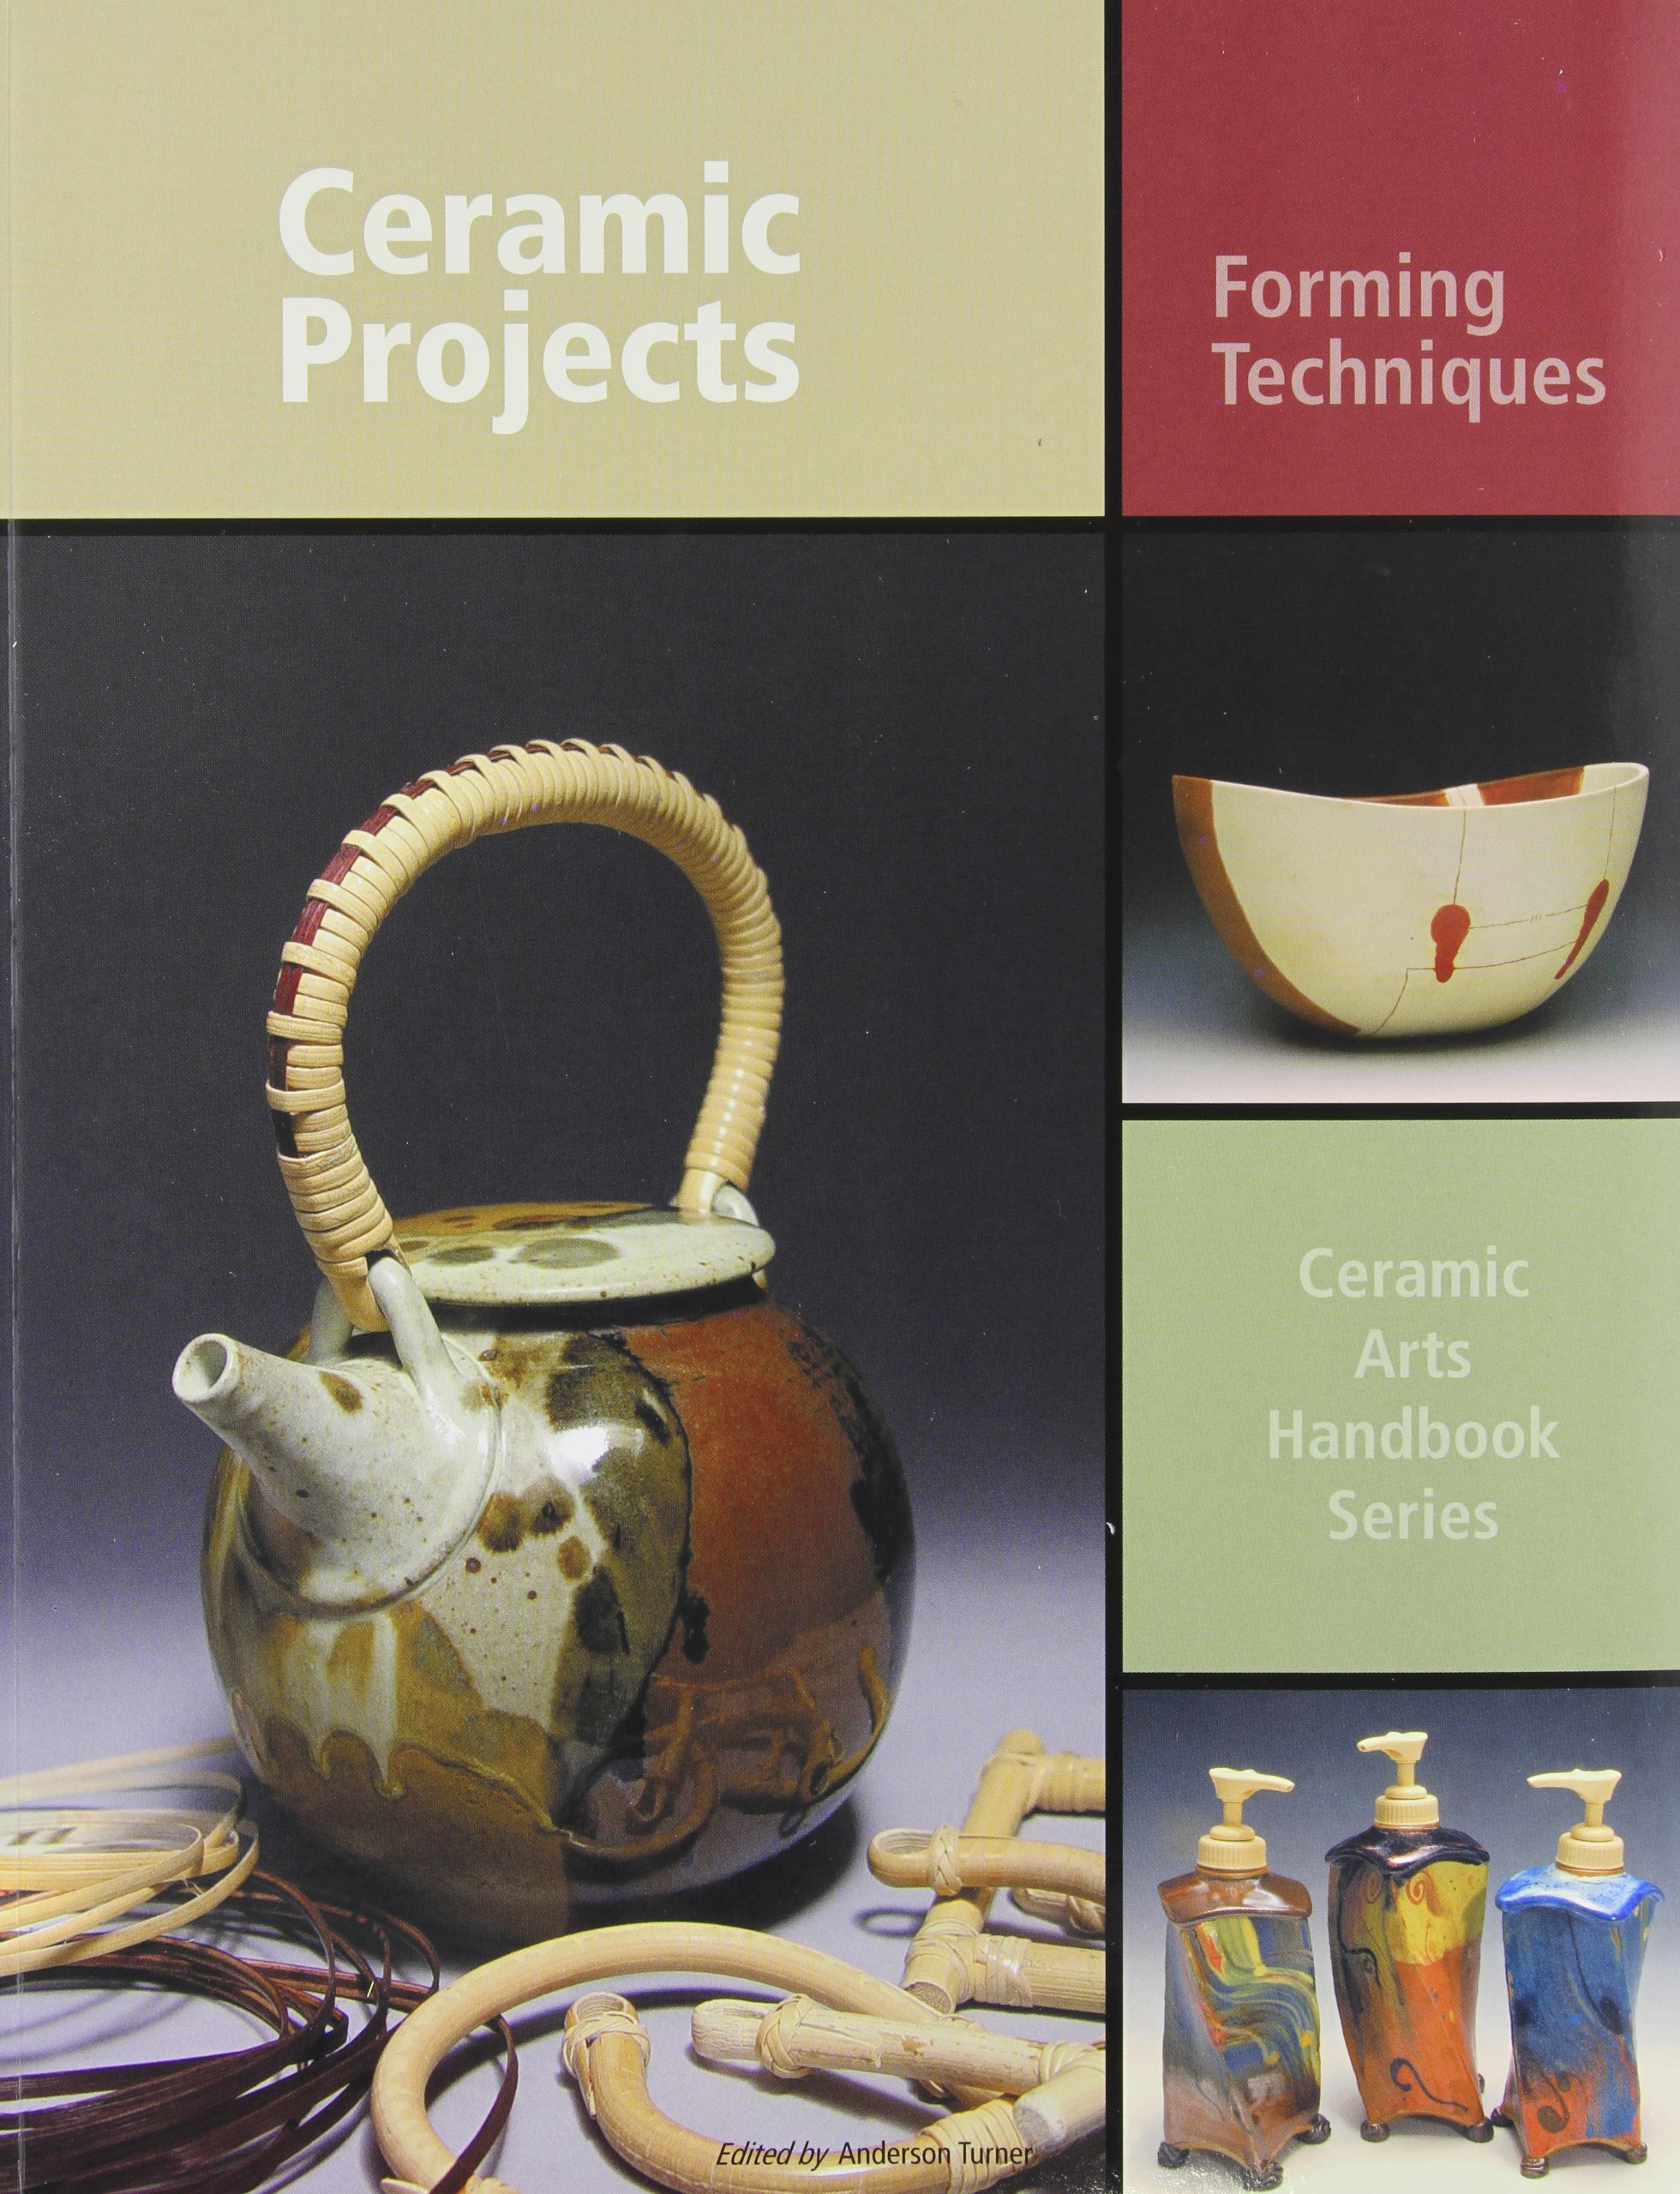 Download Ceramic Projects: Forming Techniques (Ceramic Arts Handbook Series) PDF